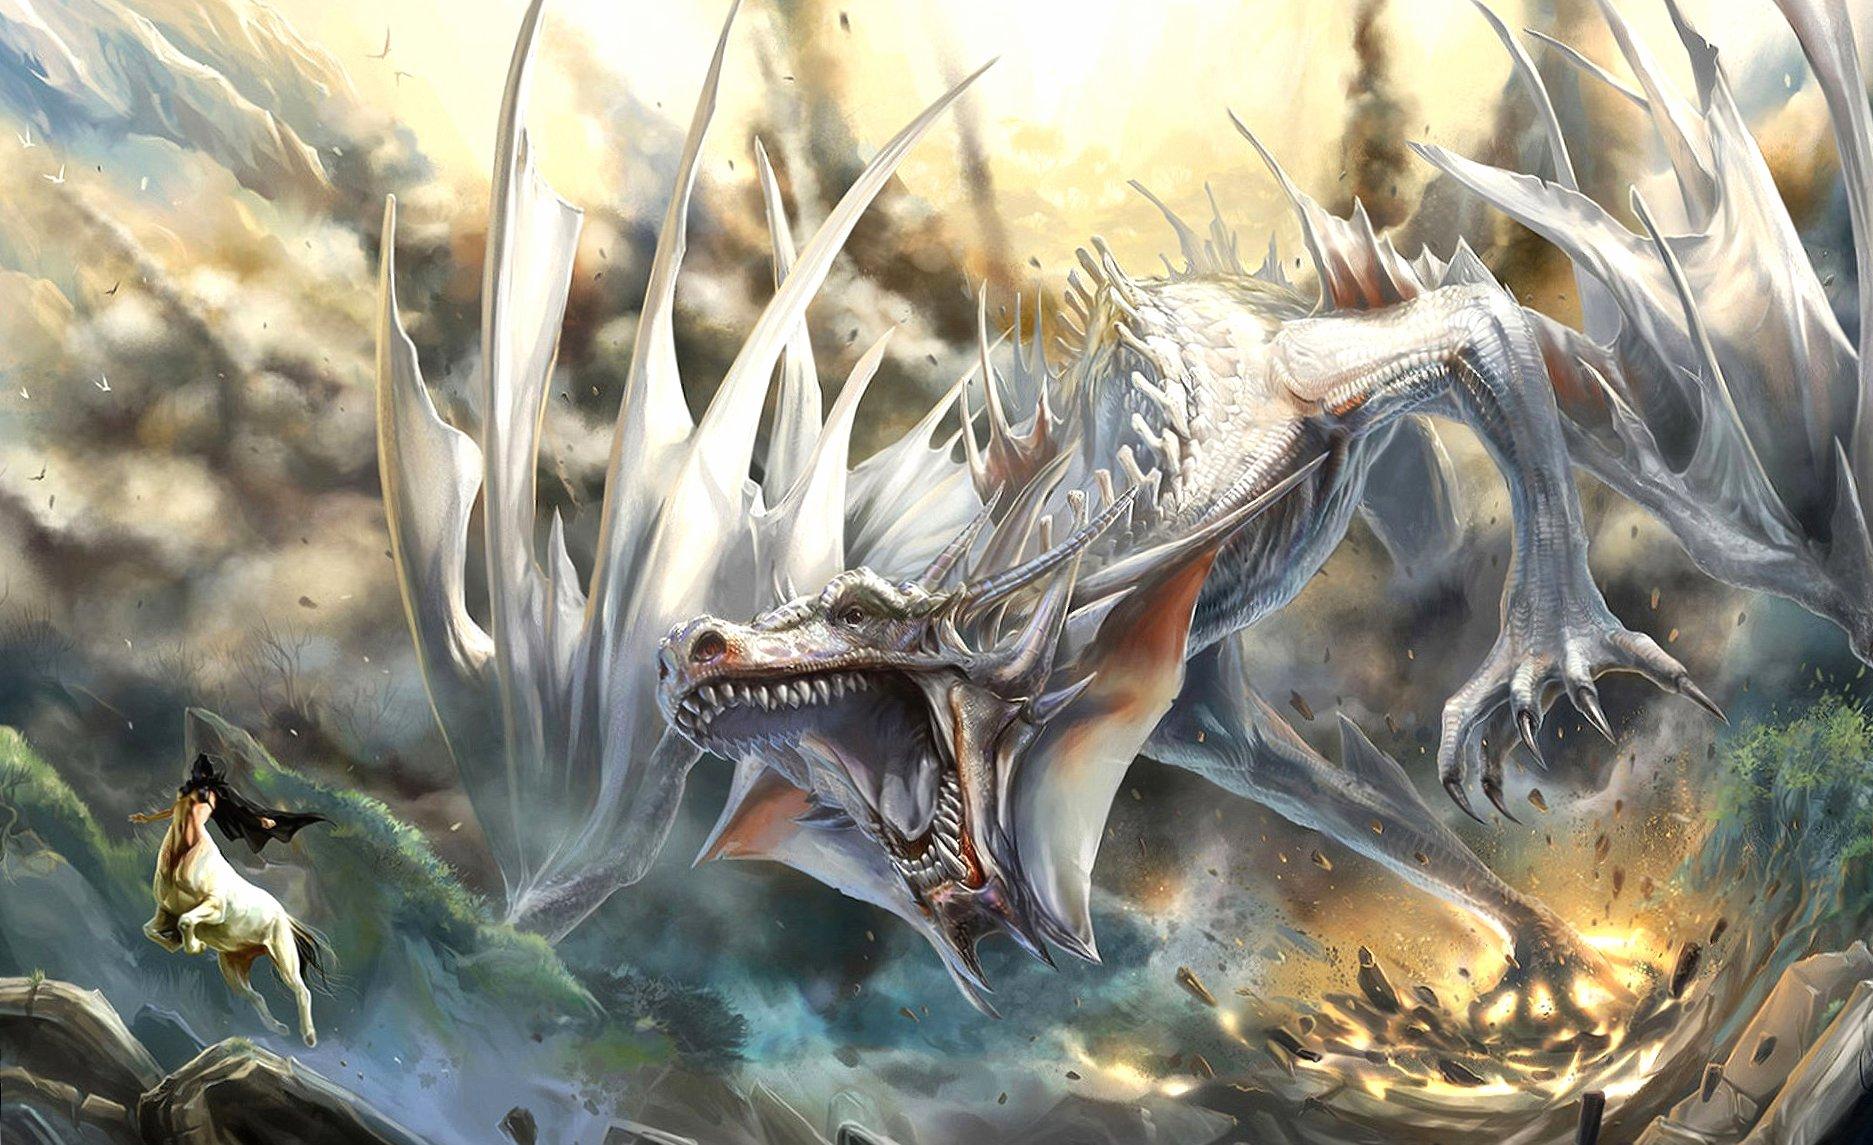 White dragon wallpapers HD quality